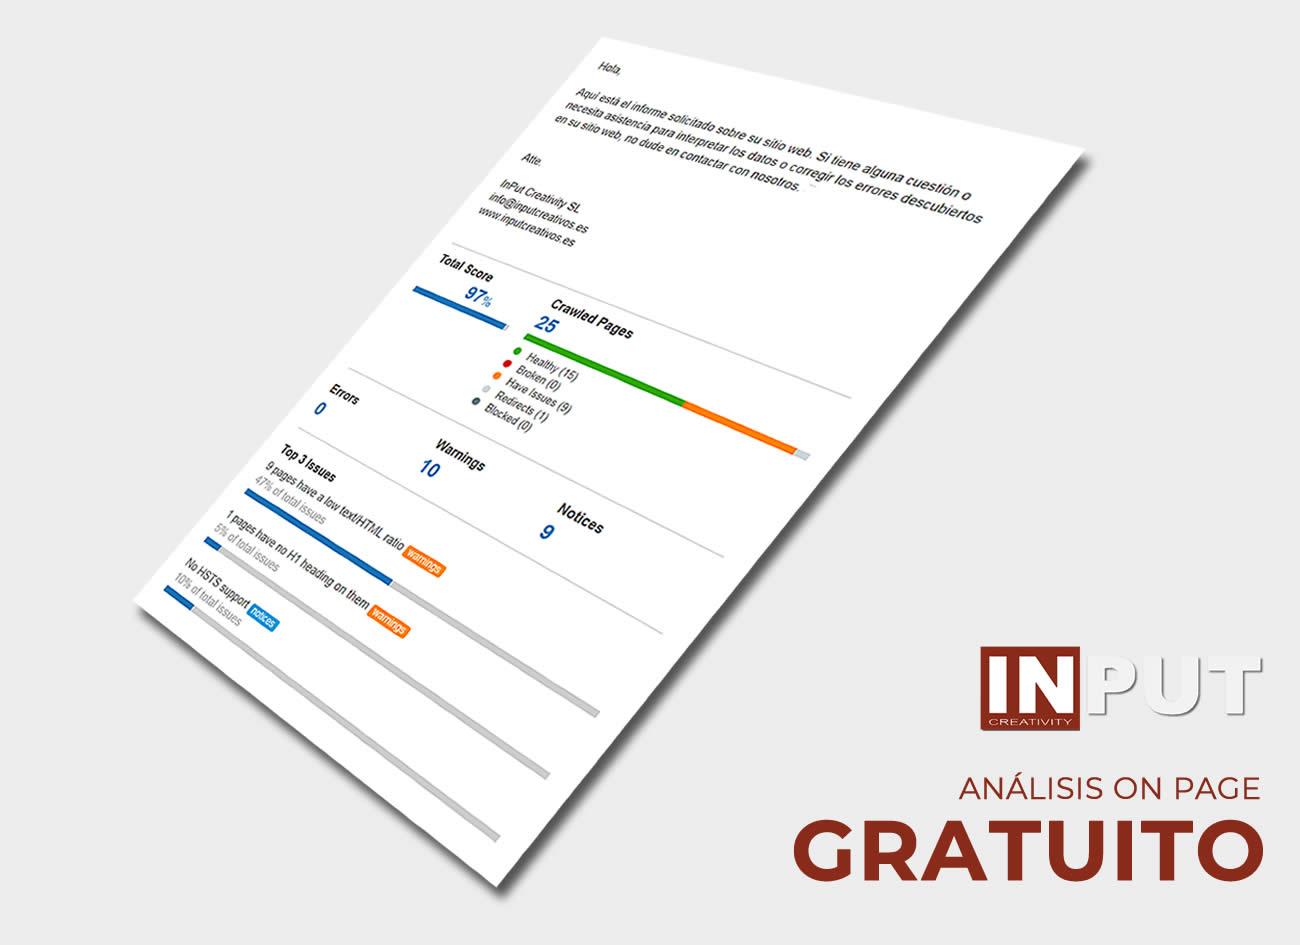 Auditoría Web Gratis en InPut Creativity